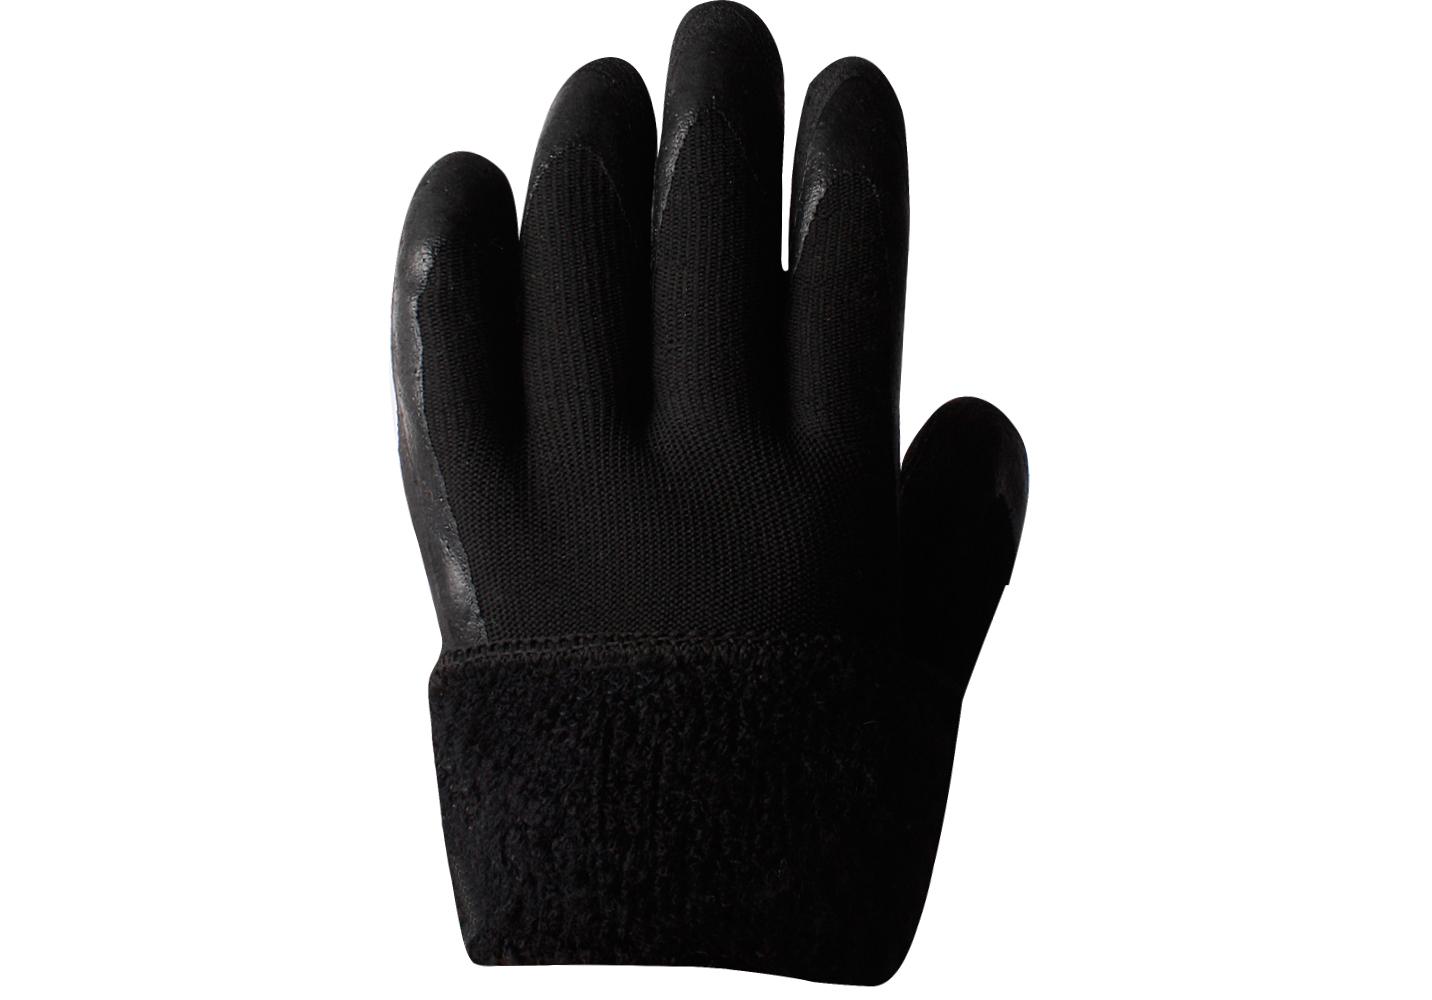 Latex Coated Acrylic Safety Work Gloves/LCG-012